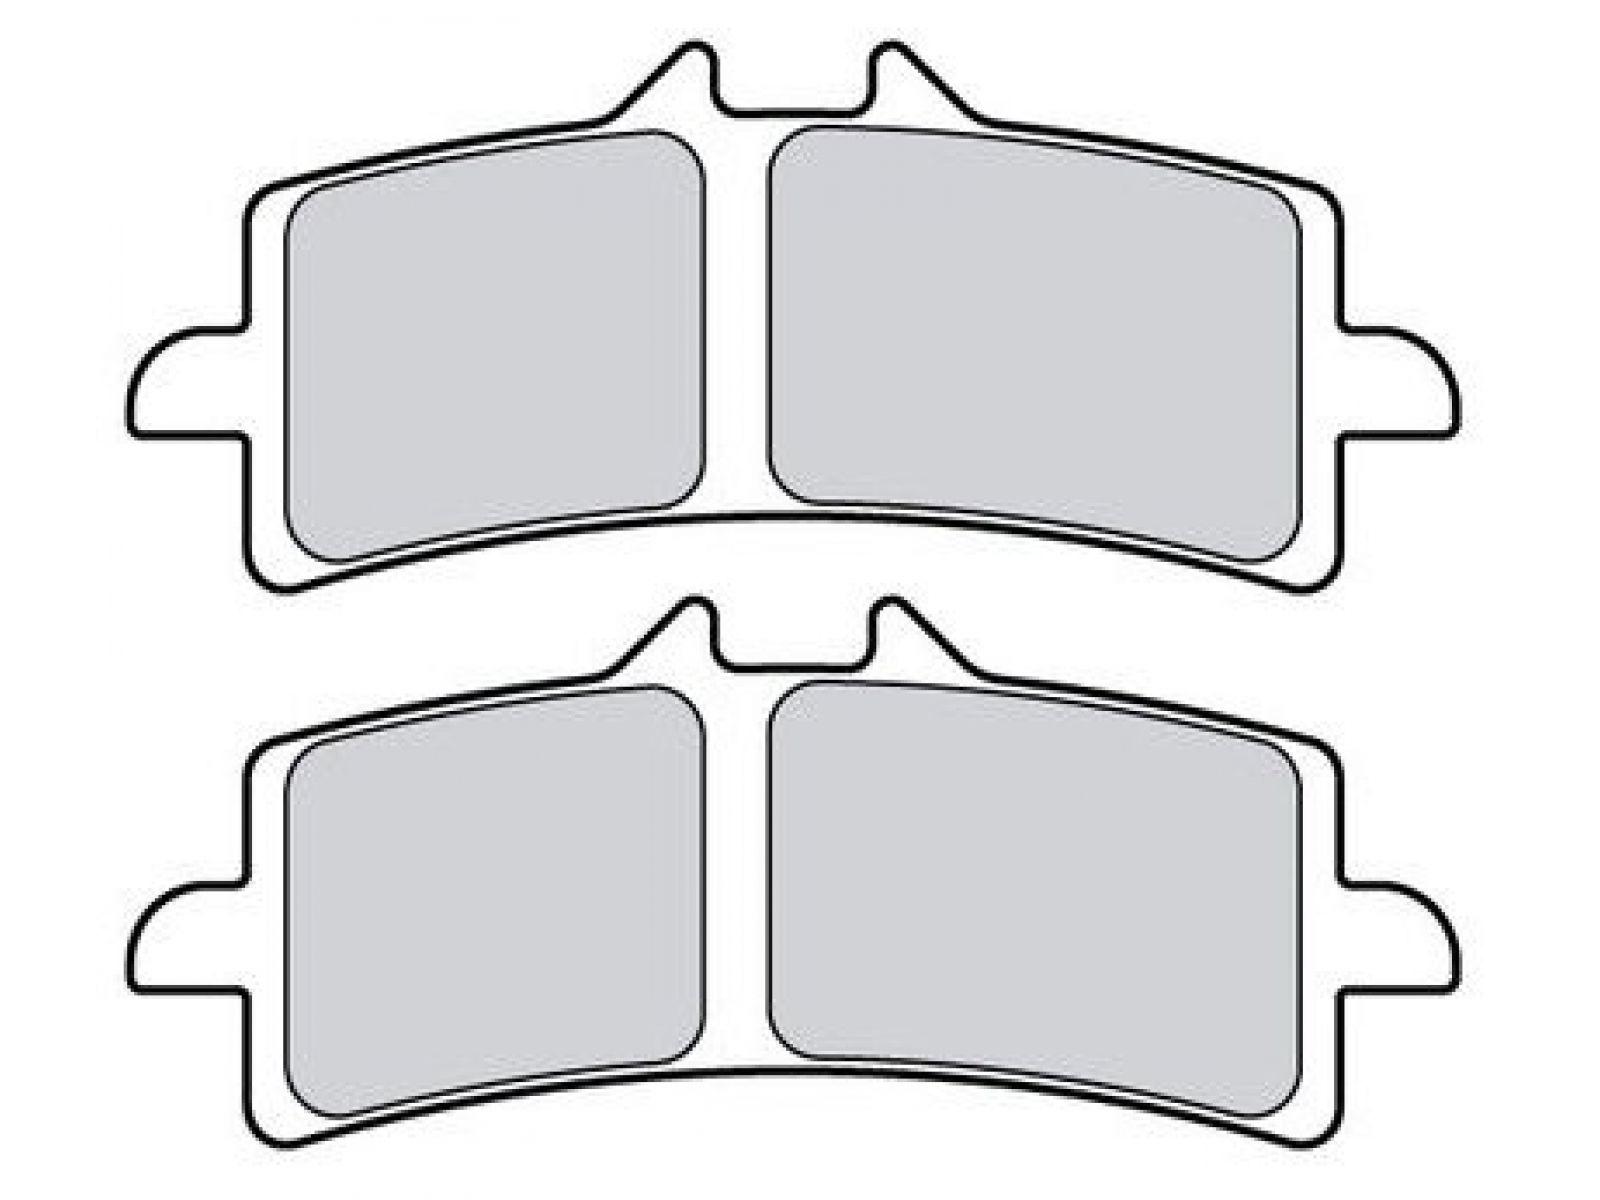 Колодки тормозные Brembo Z03 Endurance для суппортов M4, GP4-RX